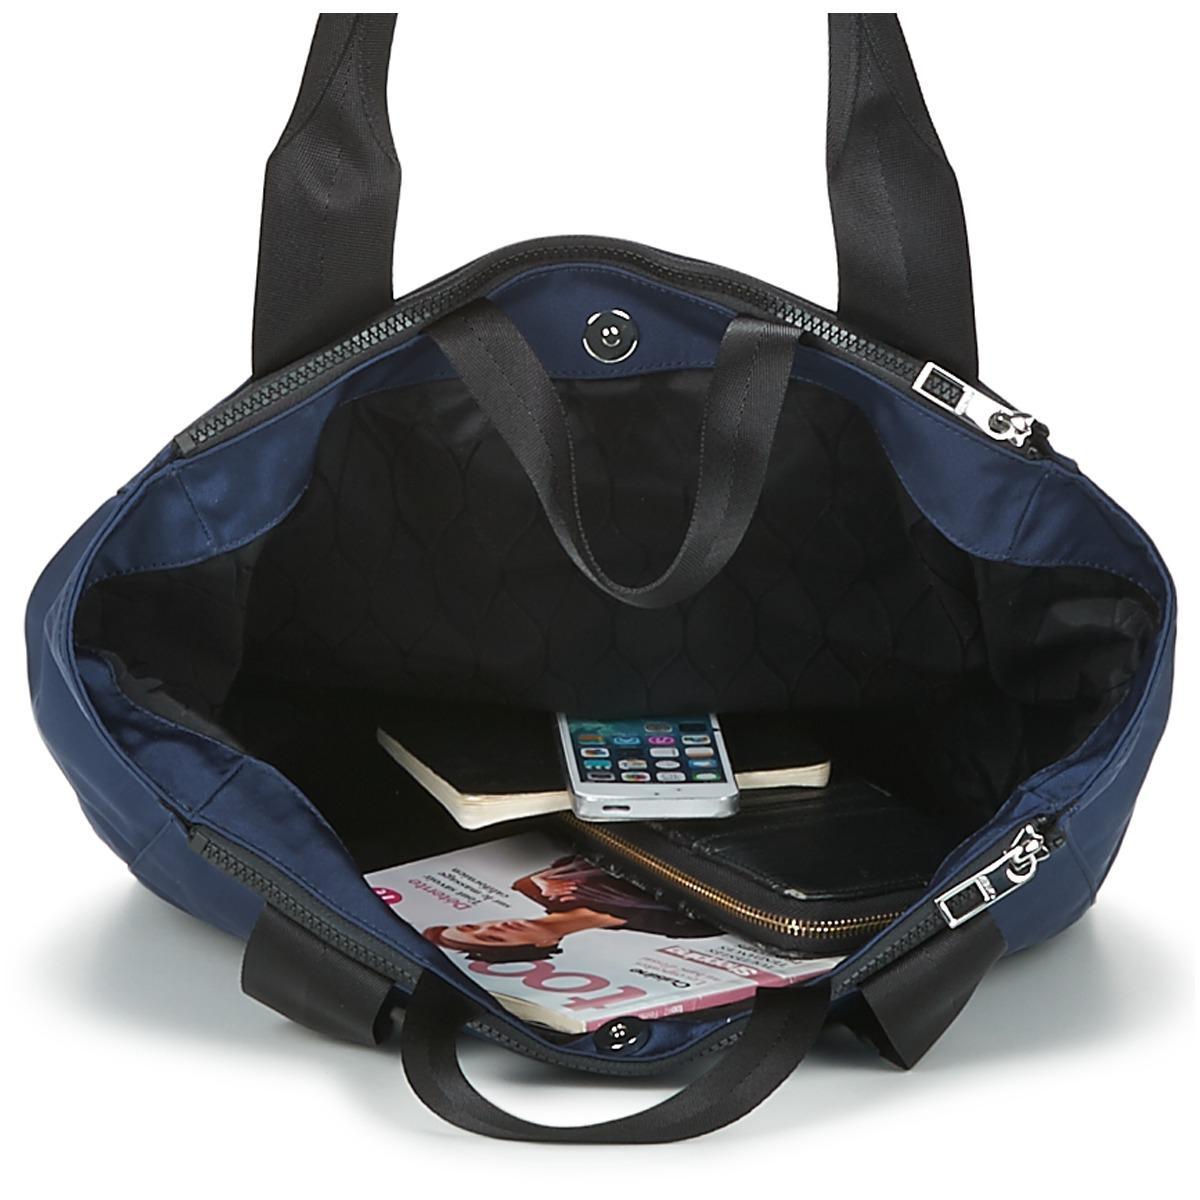 KENZO Kanvas Tiger Tote Large Women's Shopper Bag In Blue